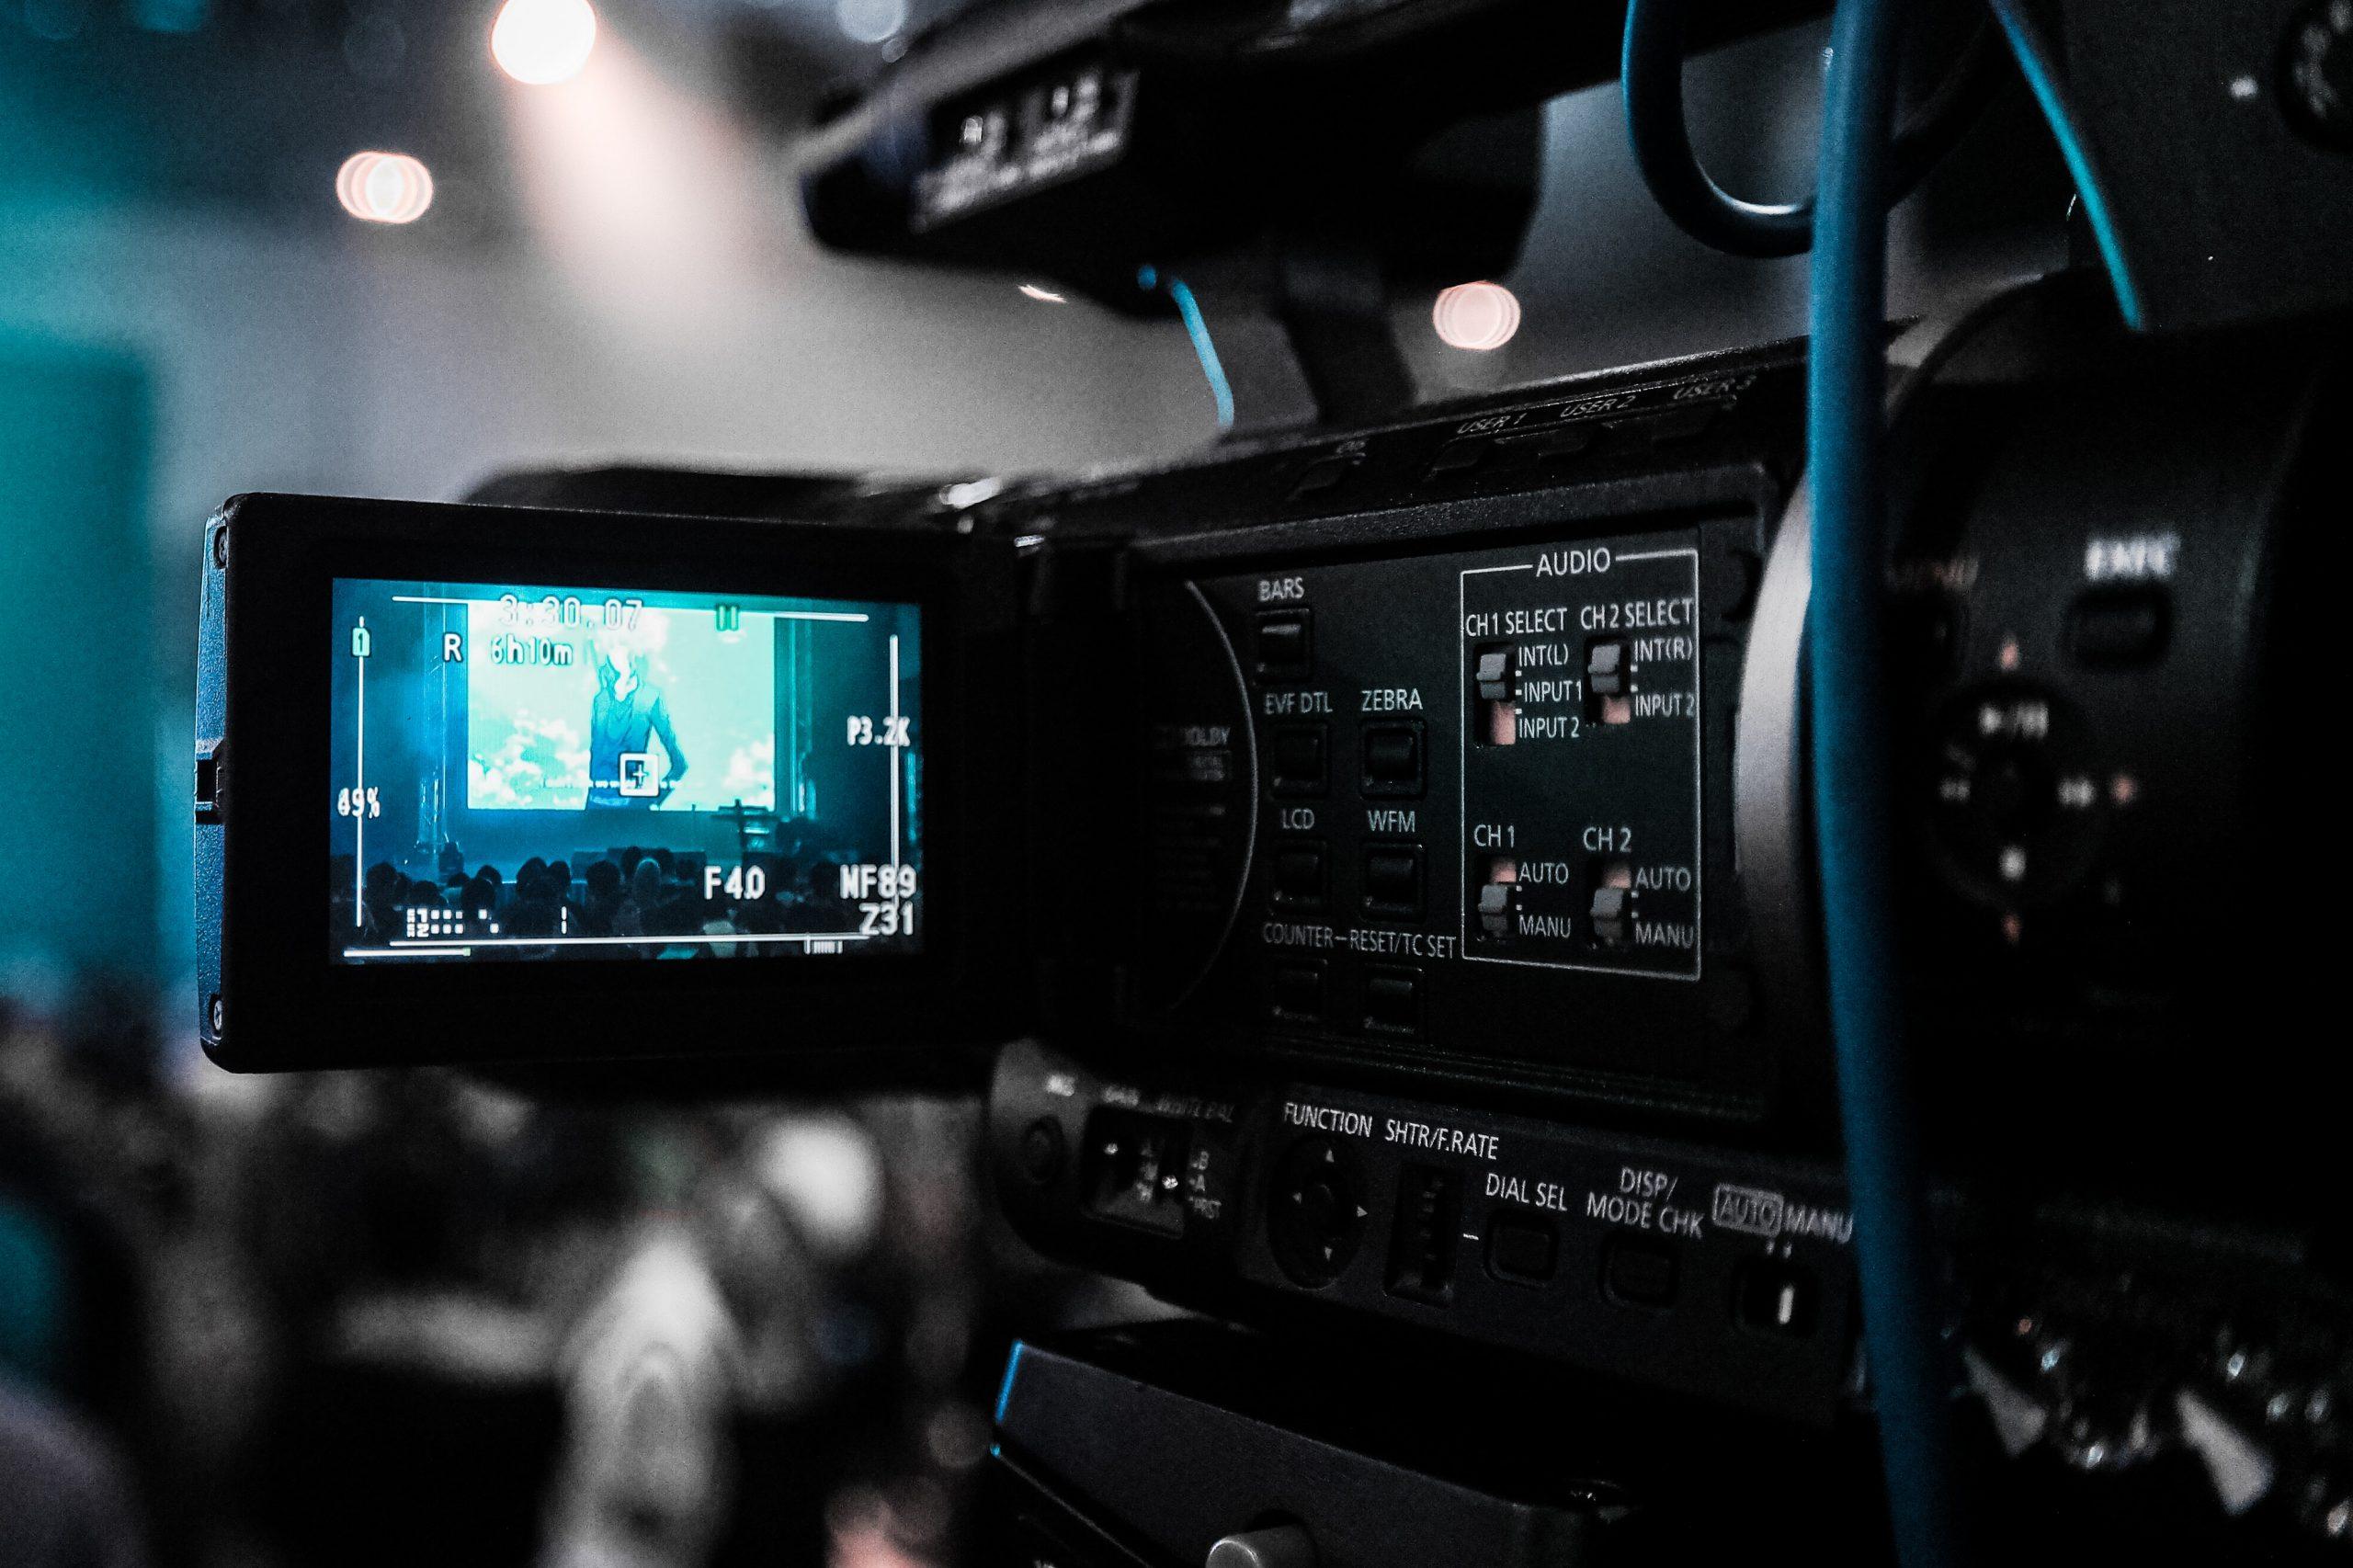 5 Top Tips to Buy Video Equipment